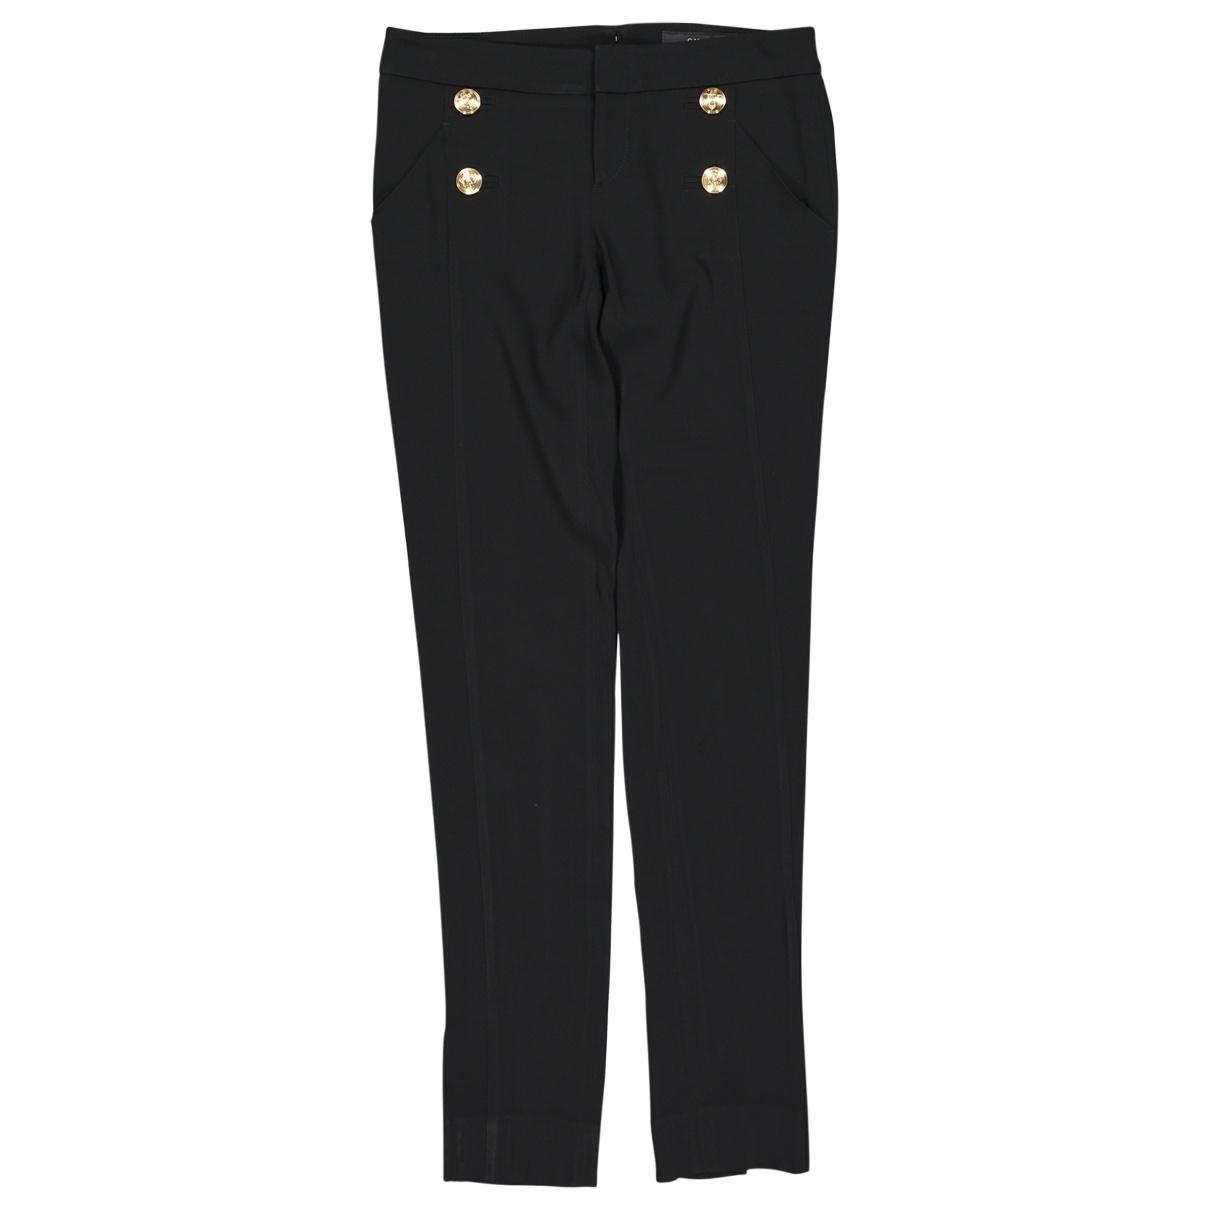 Gucci \N Black Trousers for Women 38 IT